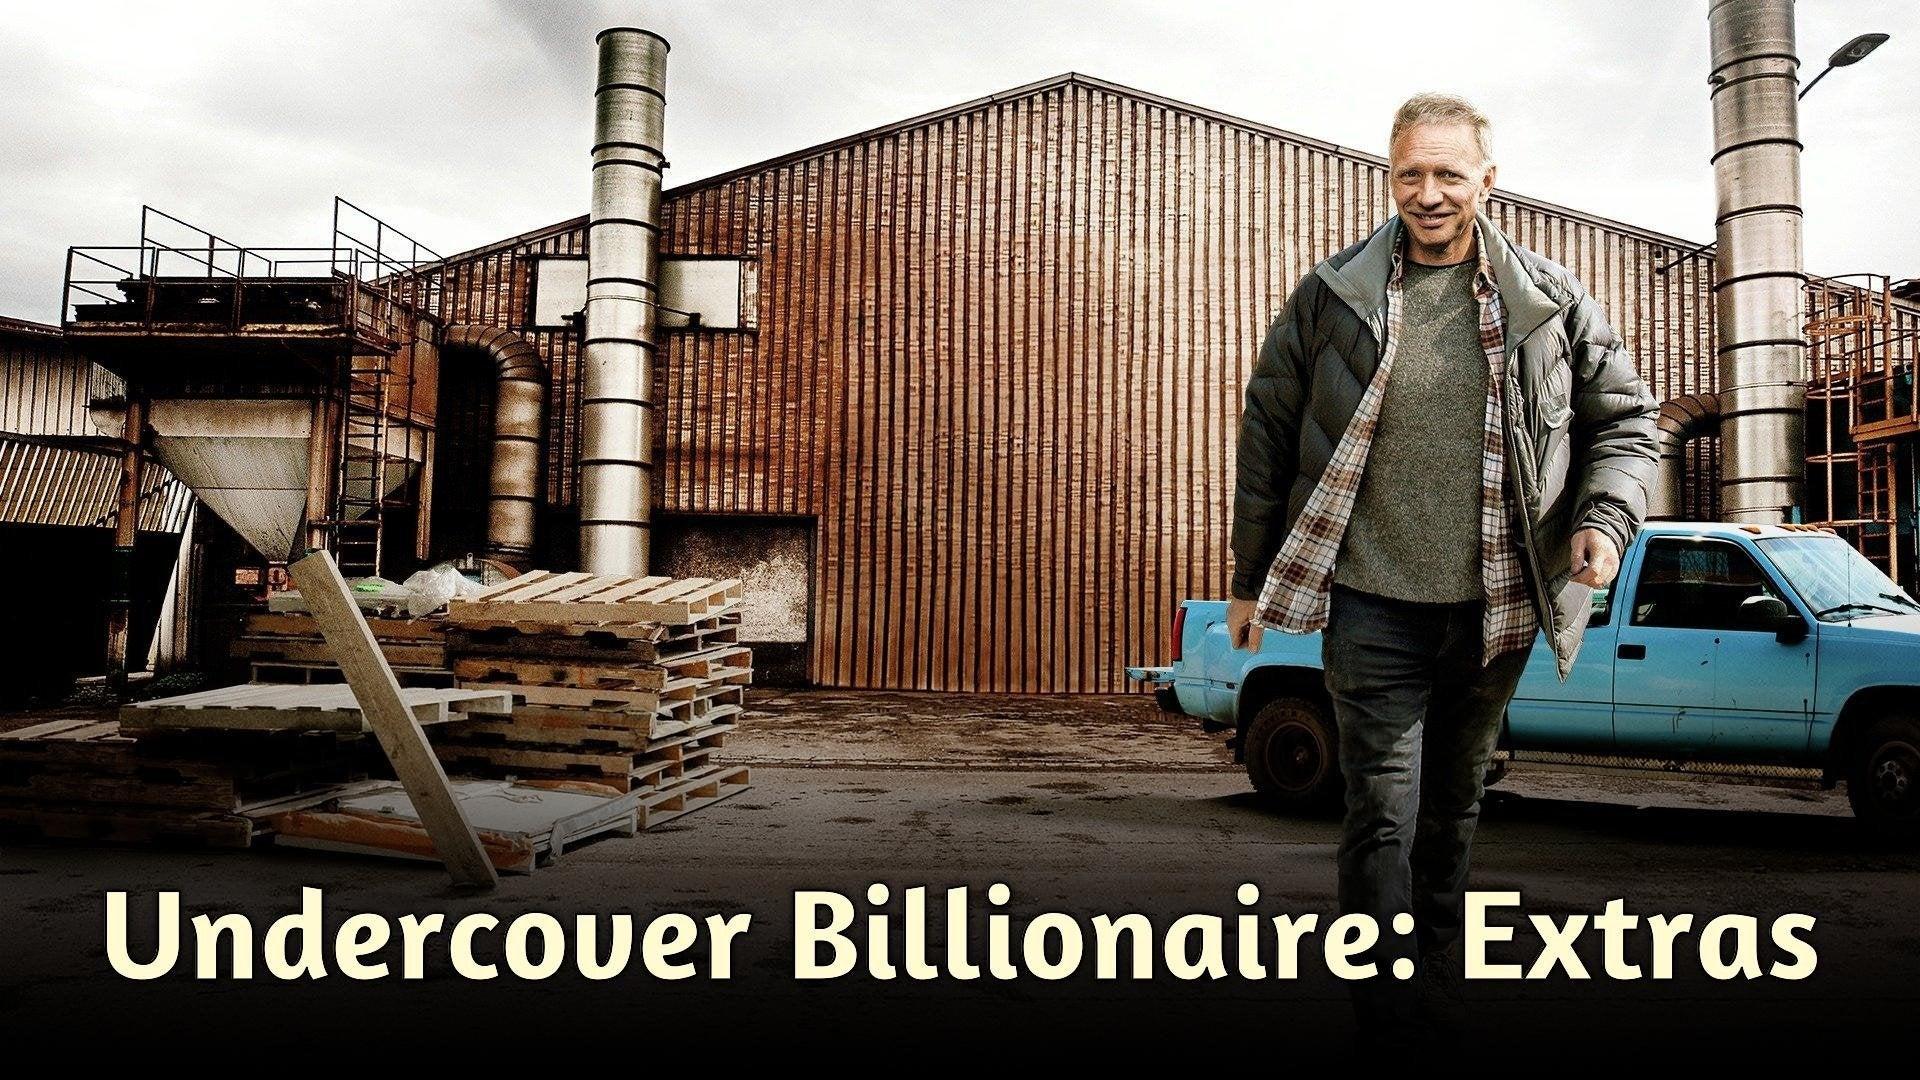 Undercover Billionaire: Extras